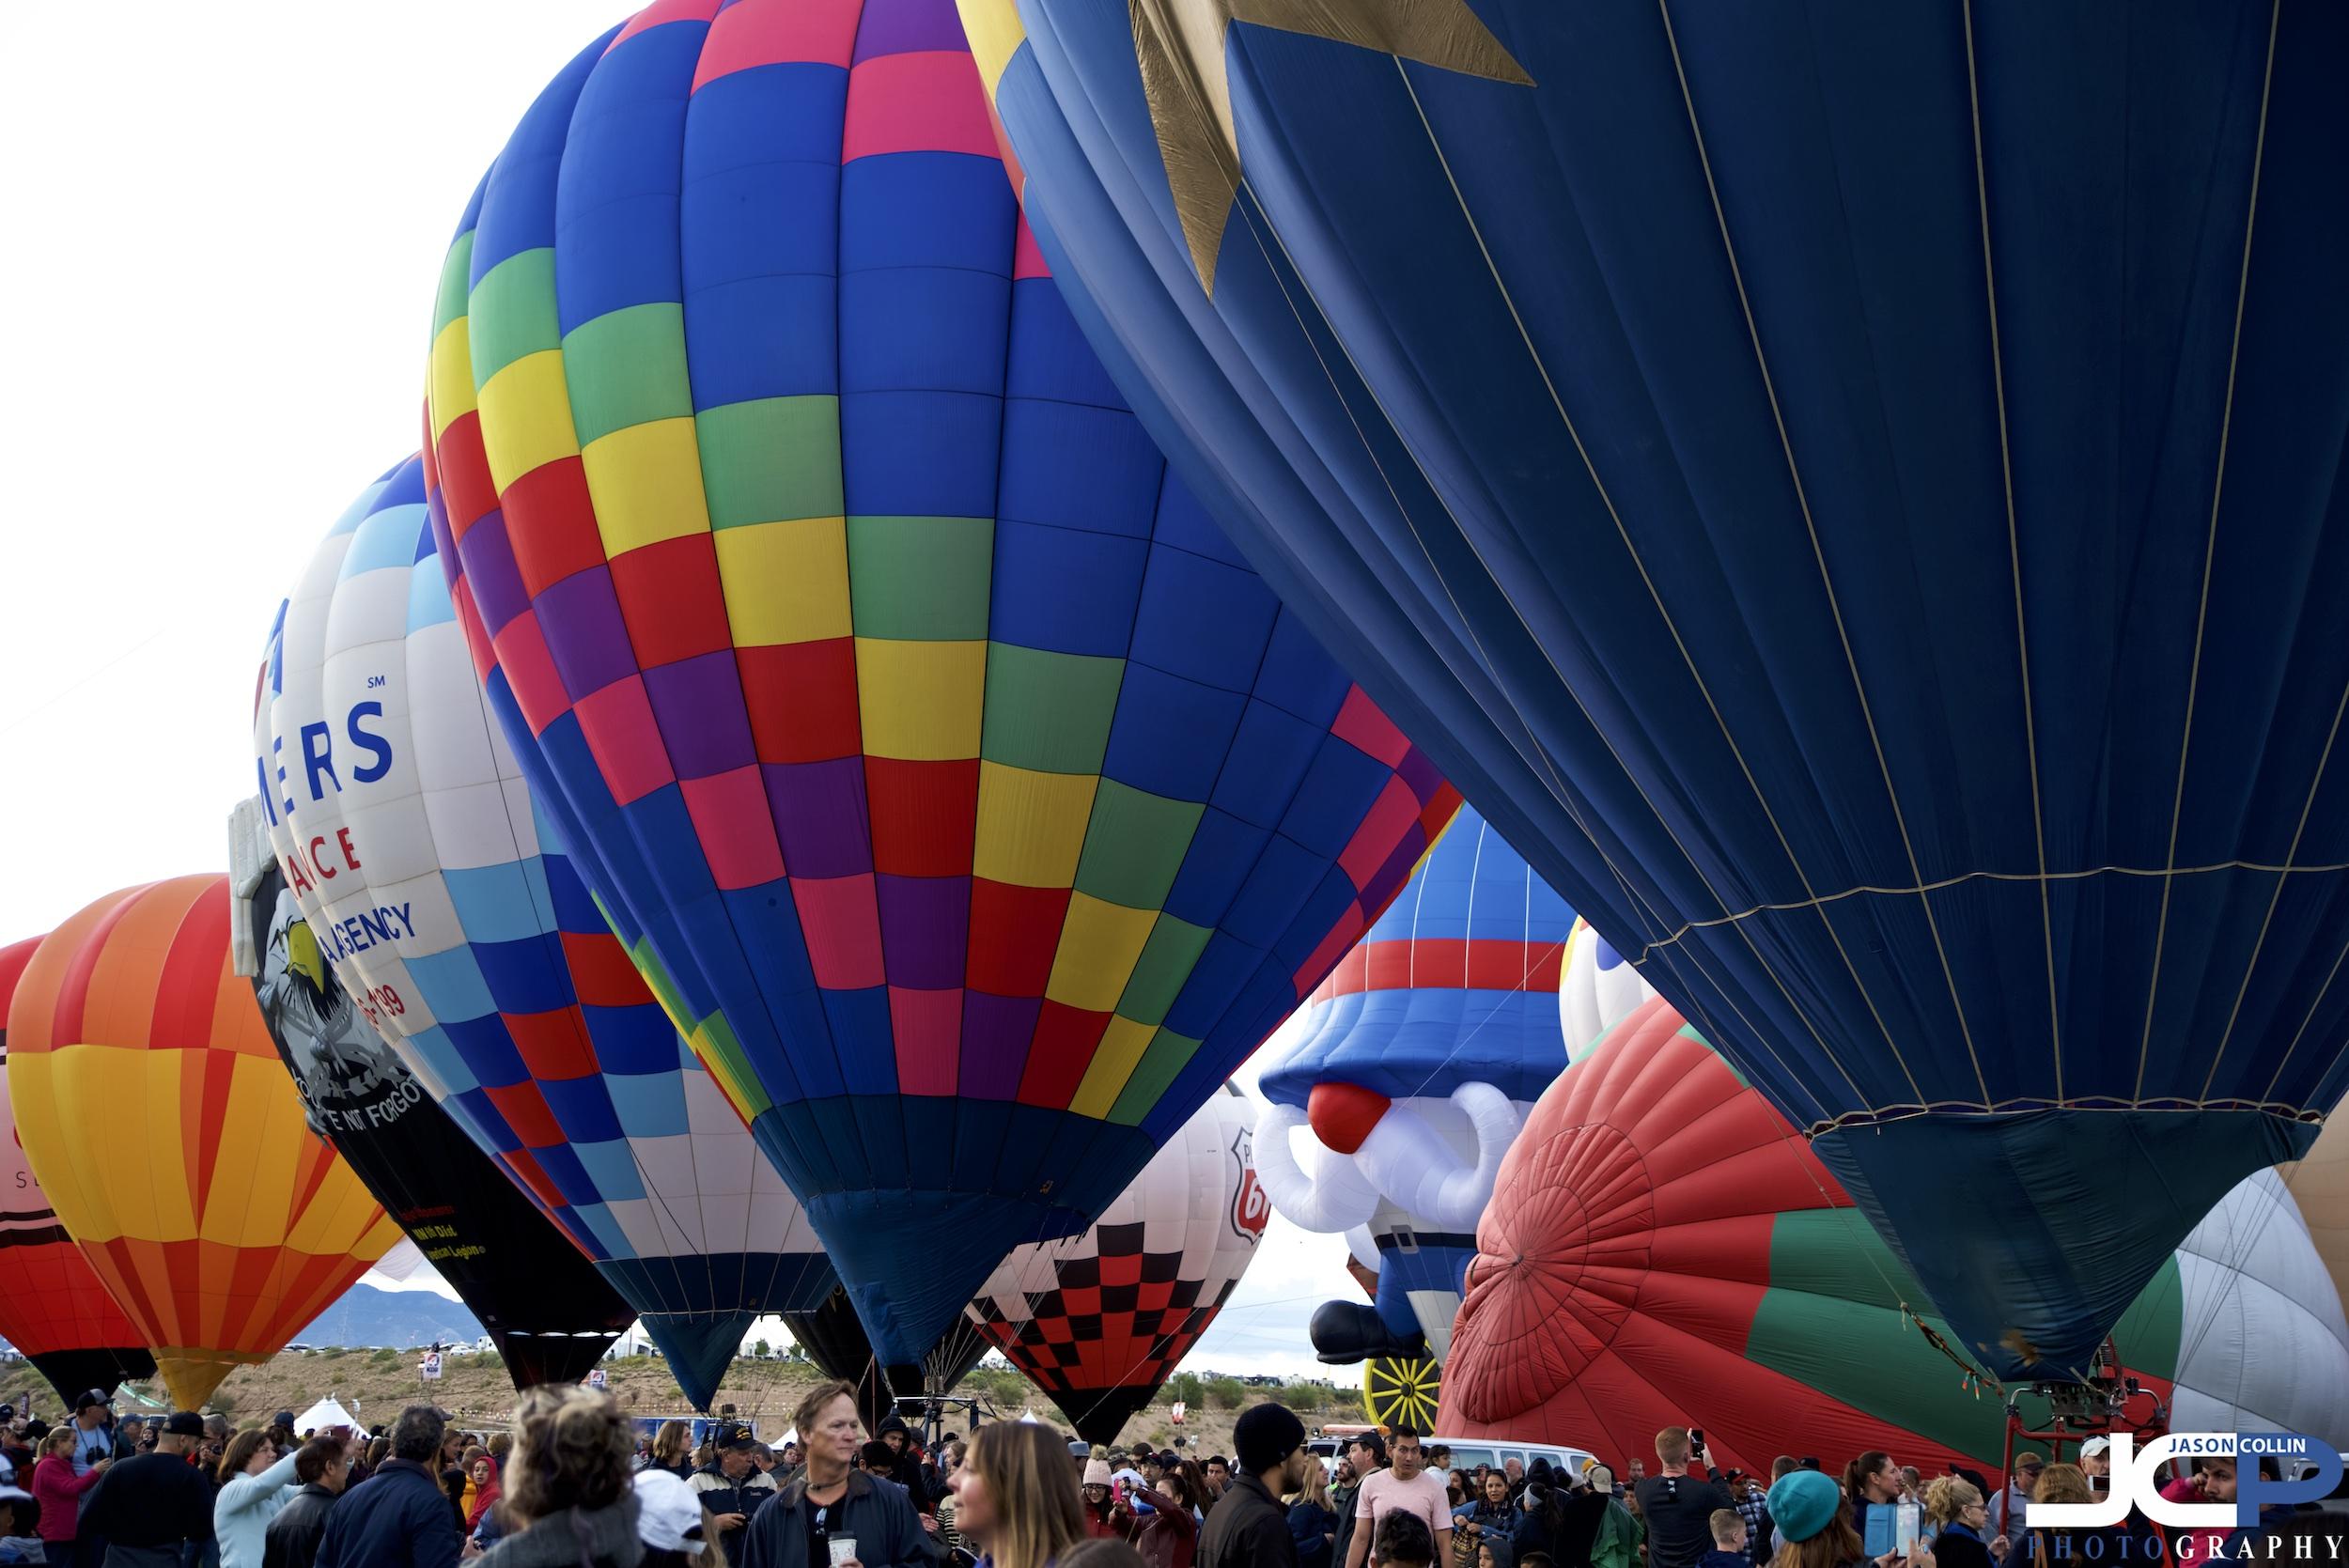 balloon-fiesta-2018-abq-108282.jpg